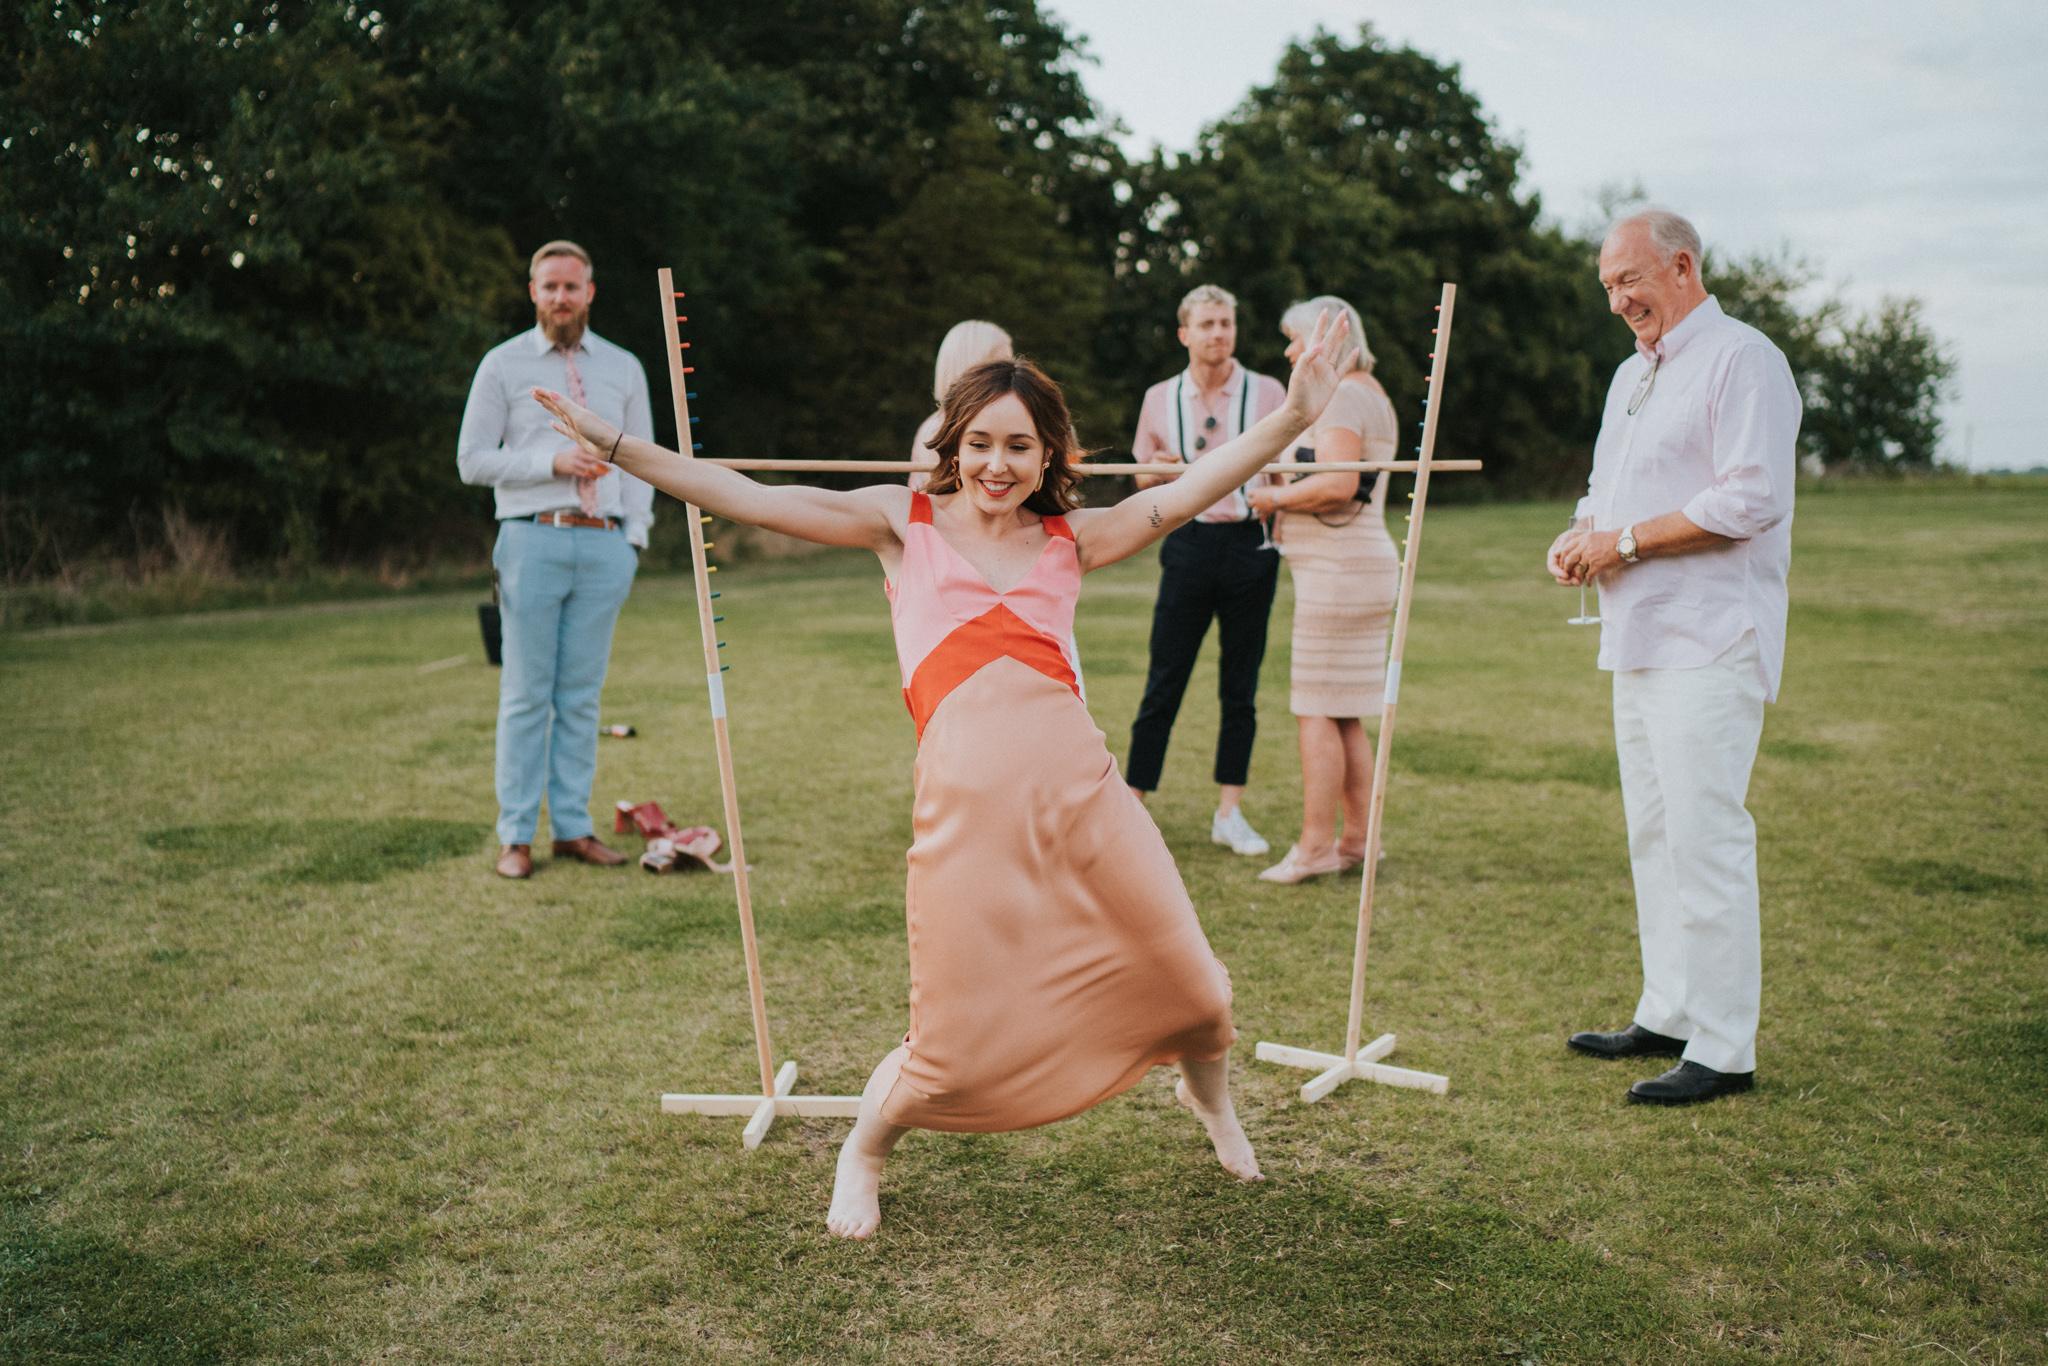 emi-Jack-boho-diy-wedding-eggington-house-grace-elizabeth-colchester-essex-alternative-wedding-photographer-suffolk-norfolk-devon (53 of 56).jpg